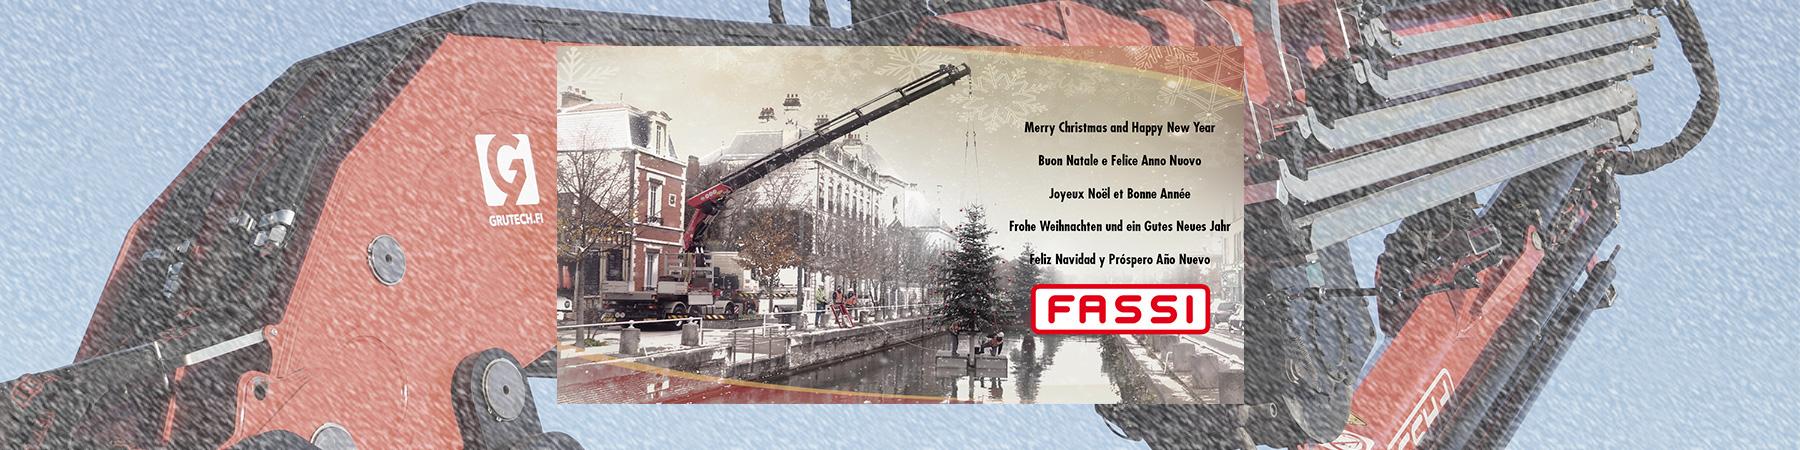 Grutech Fassi joulutervehdys